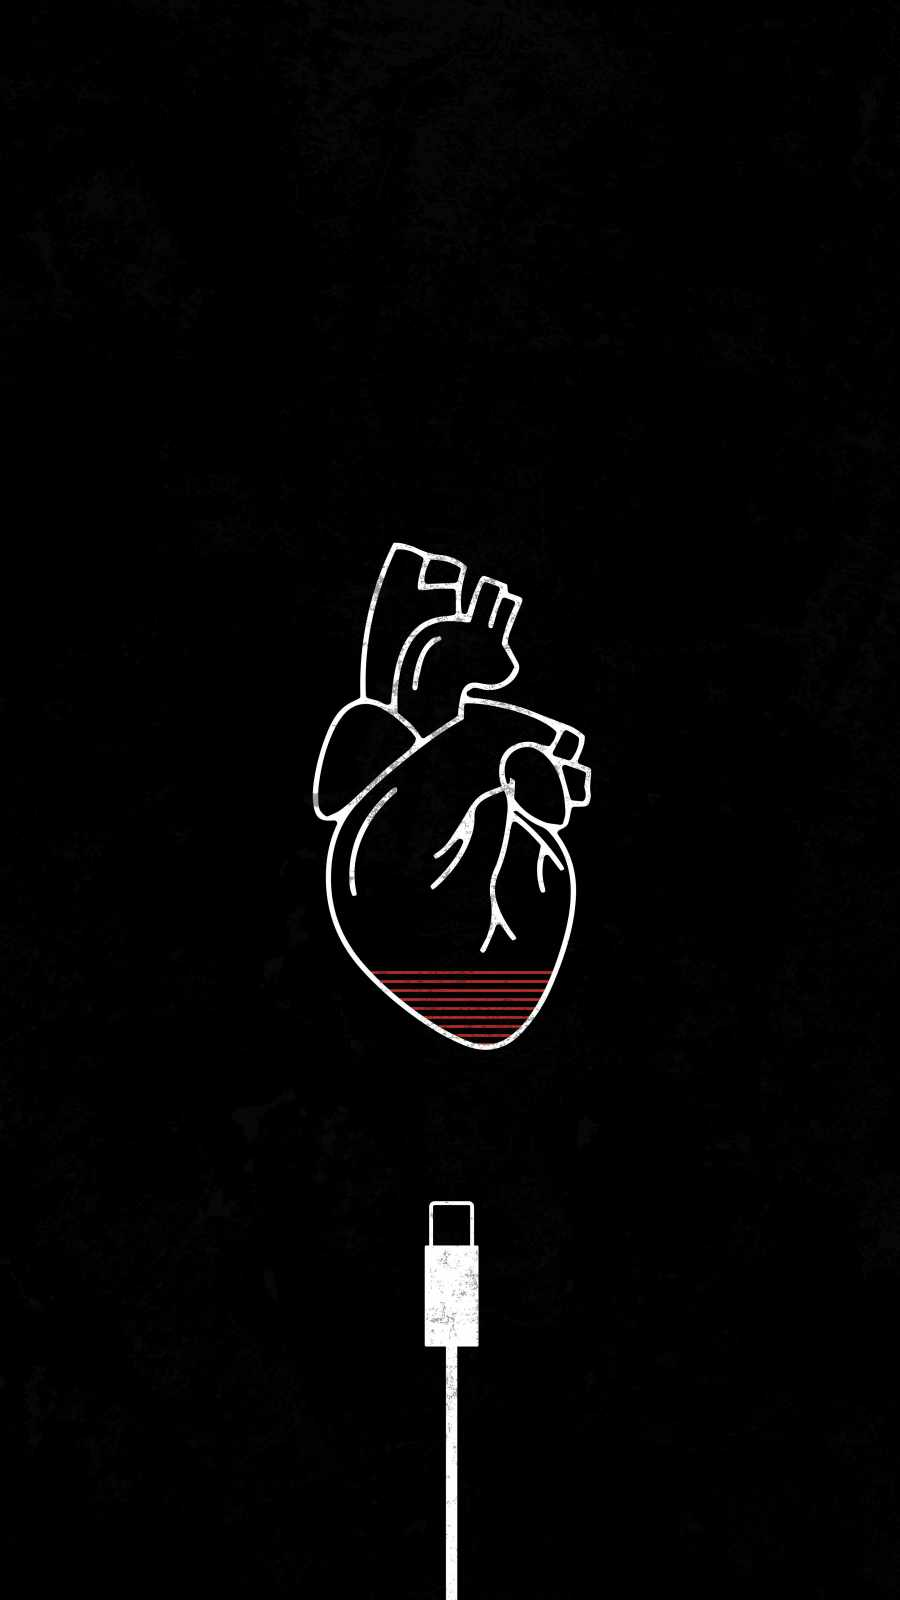 Heart Low iPhone Wallpaper